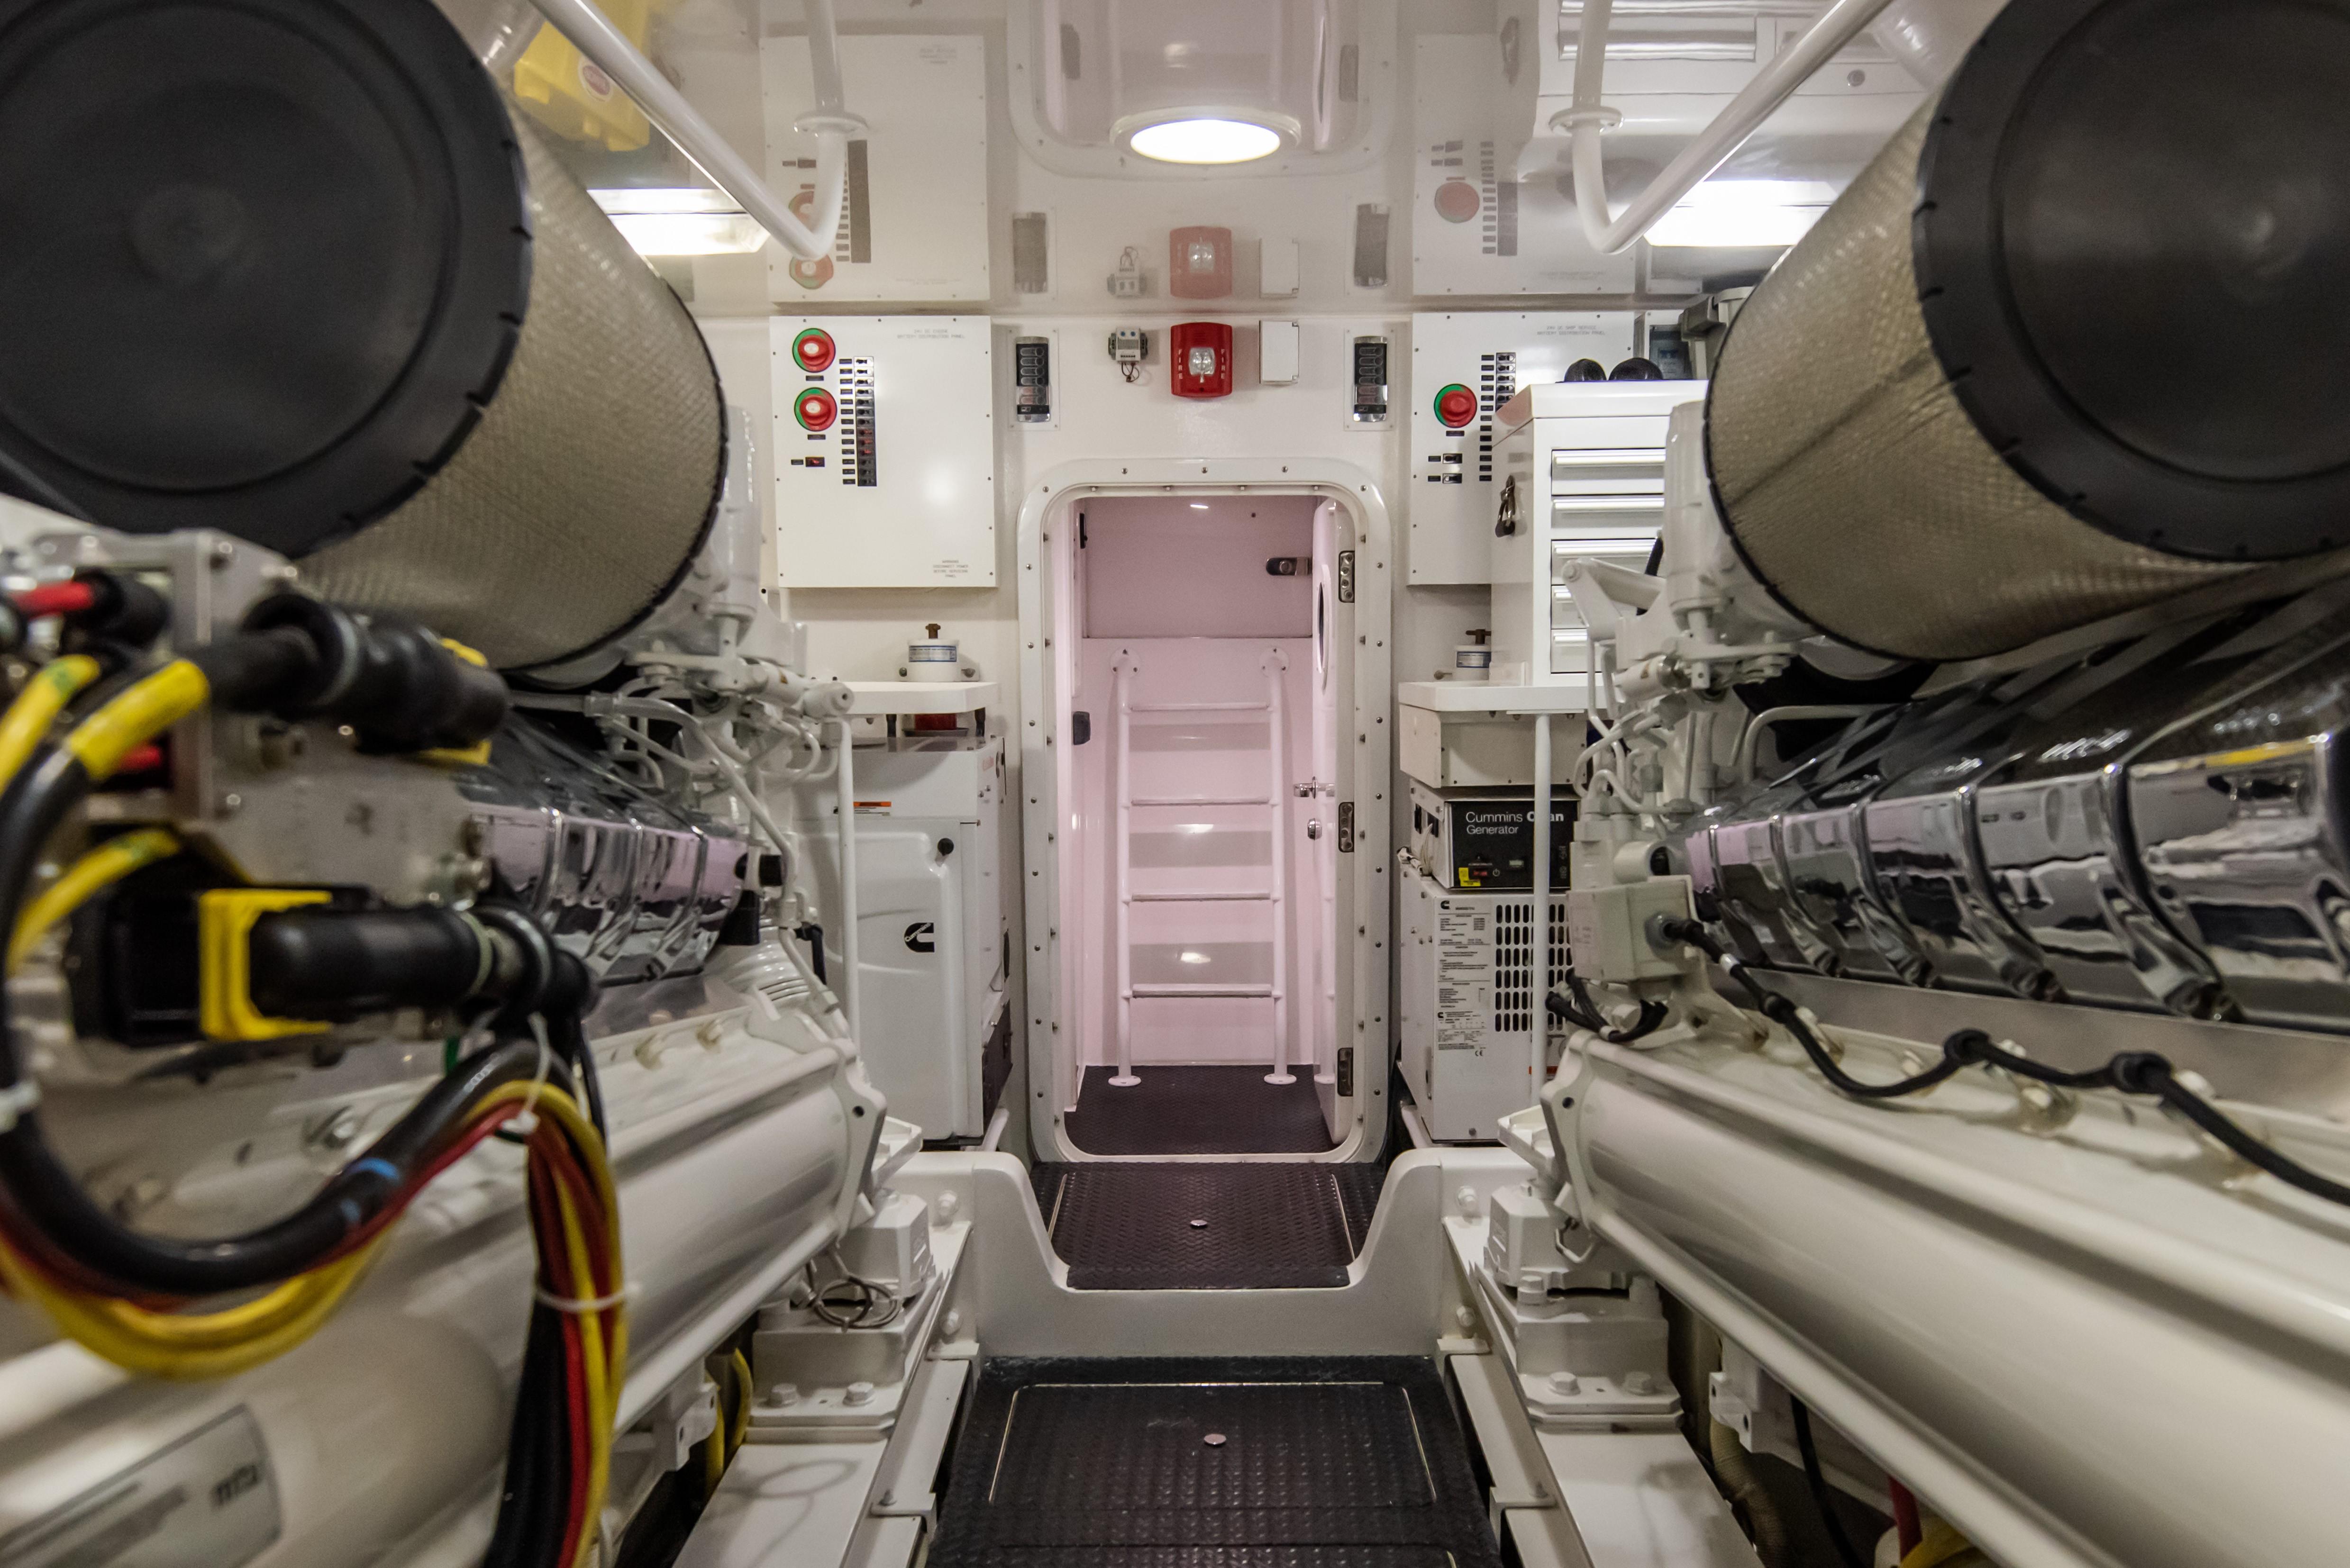 2016 Viking 70 Enclosed Bridge Yacht For Sale | Marlin